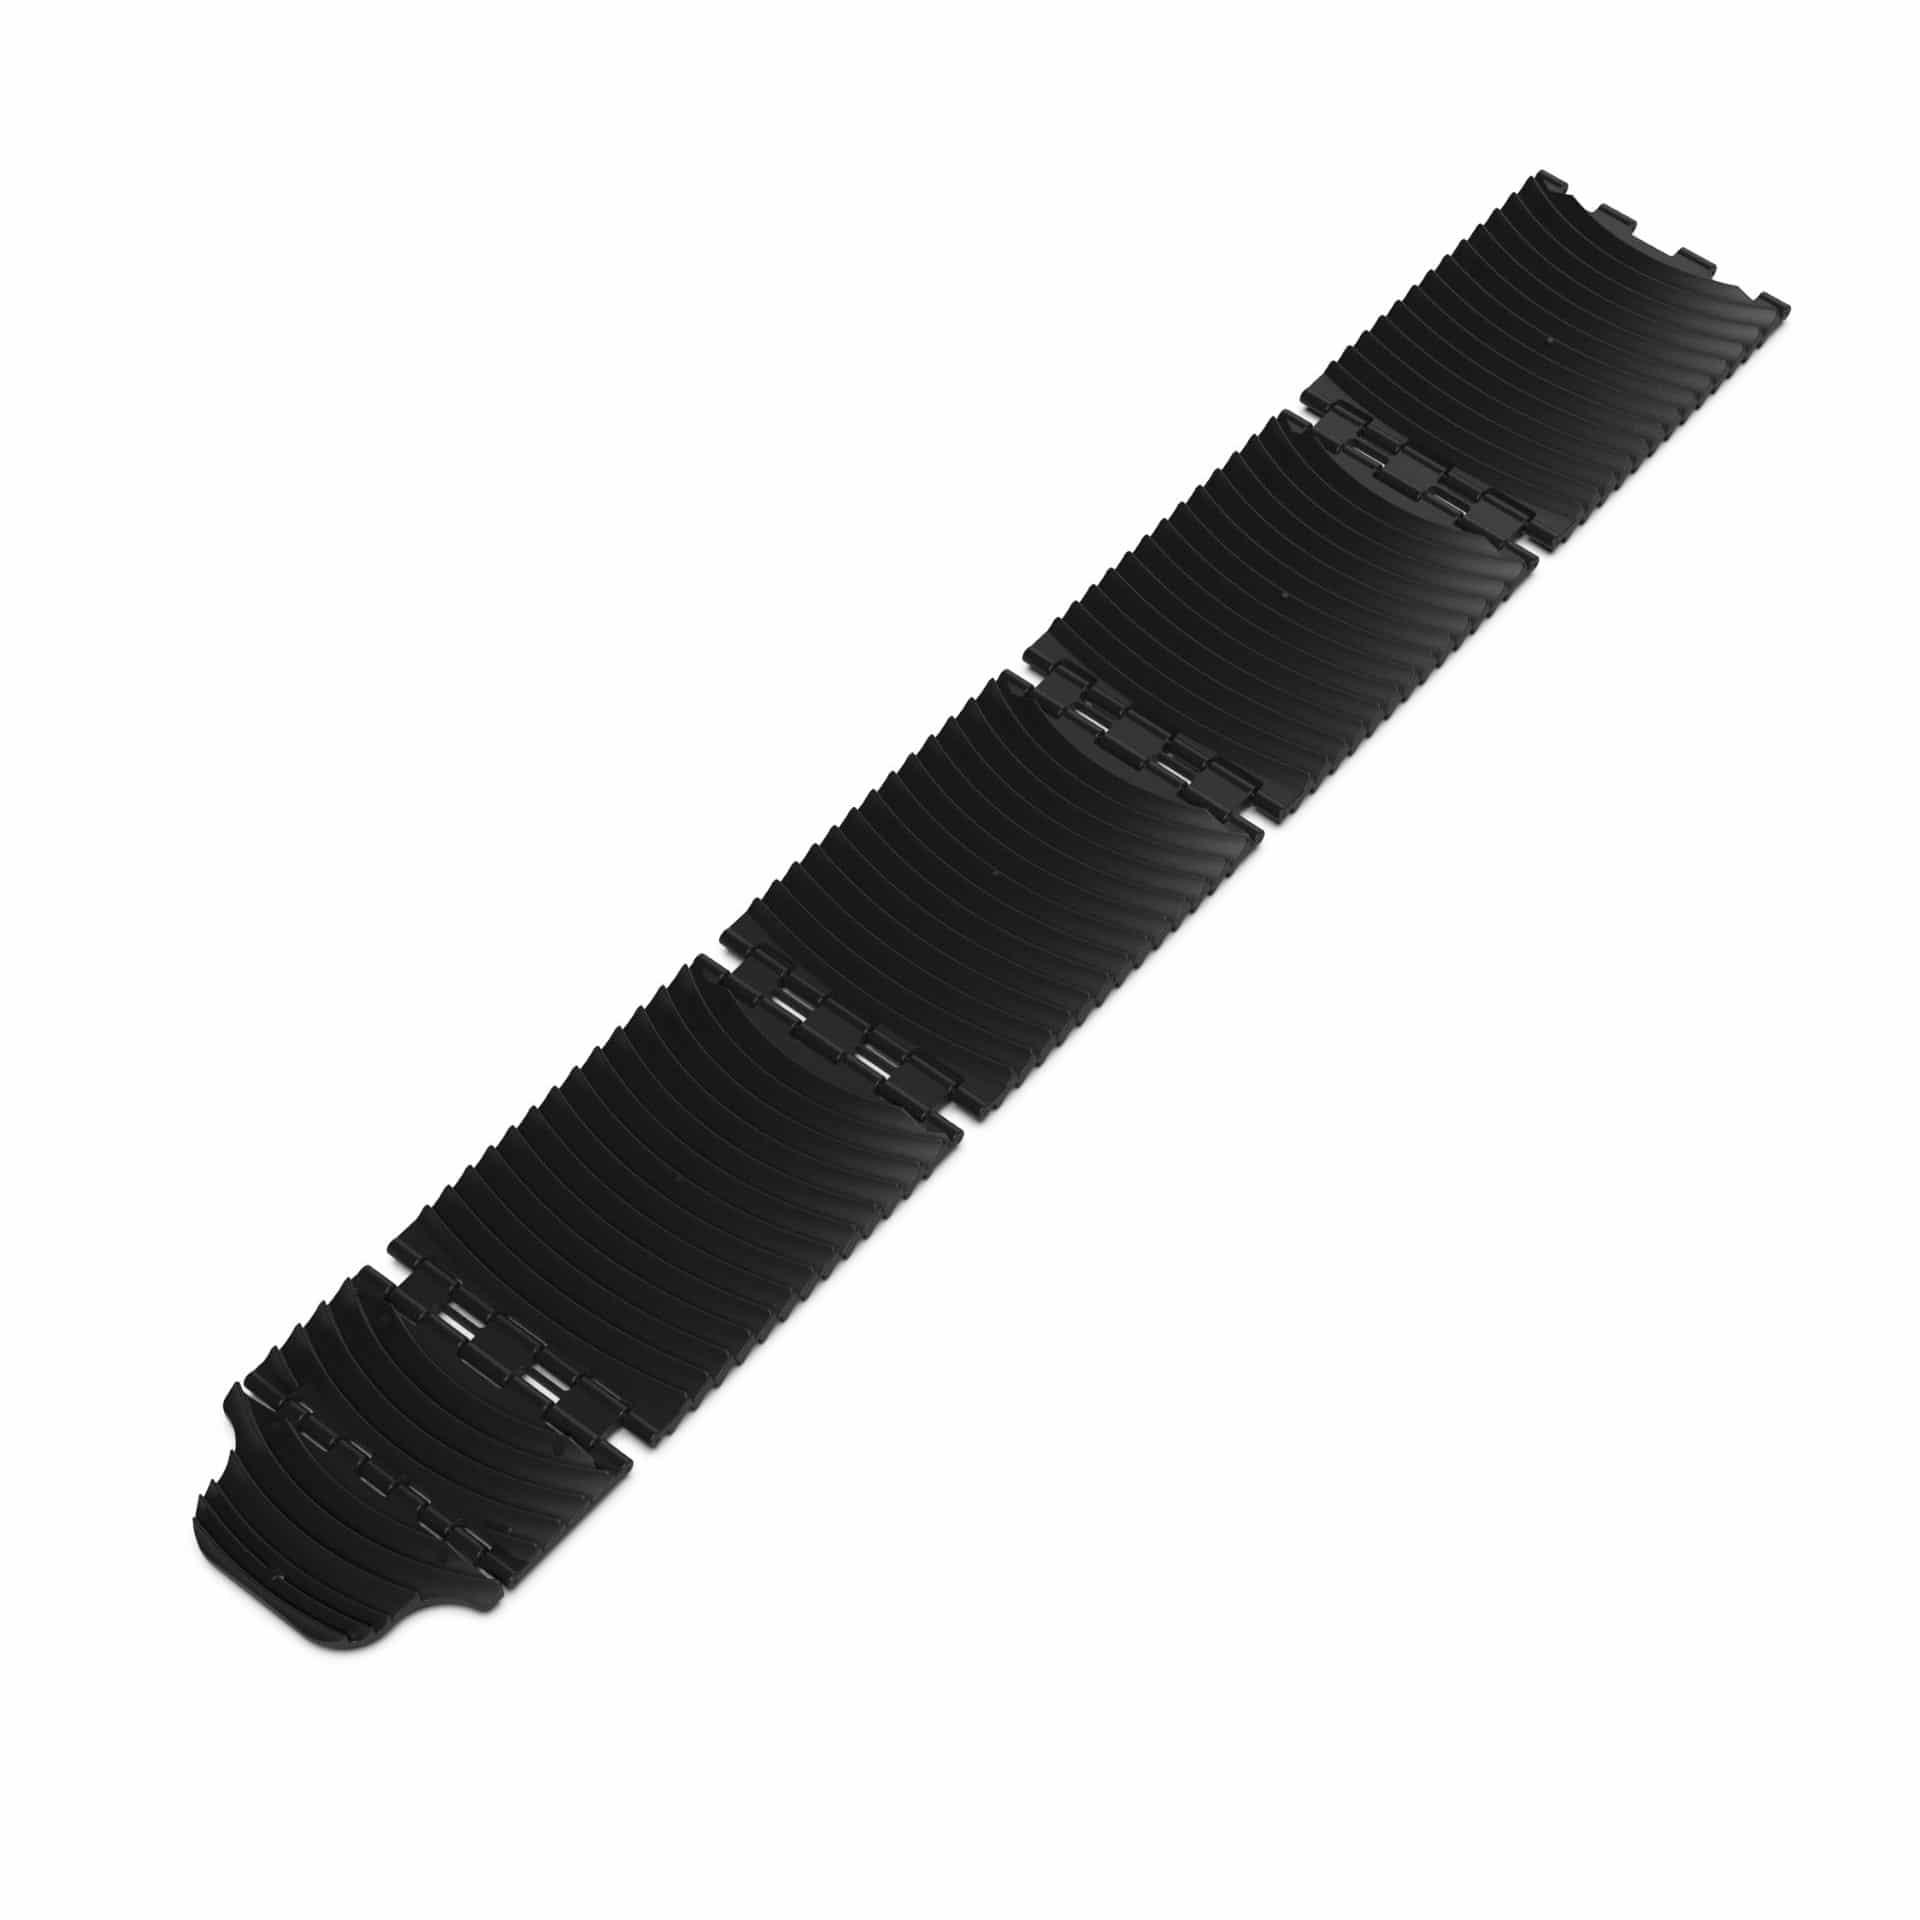 Black XL GoTreads - Single Extended